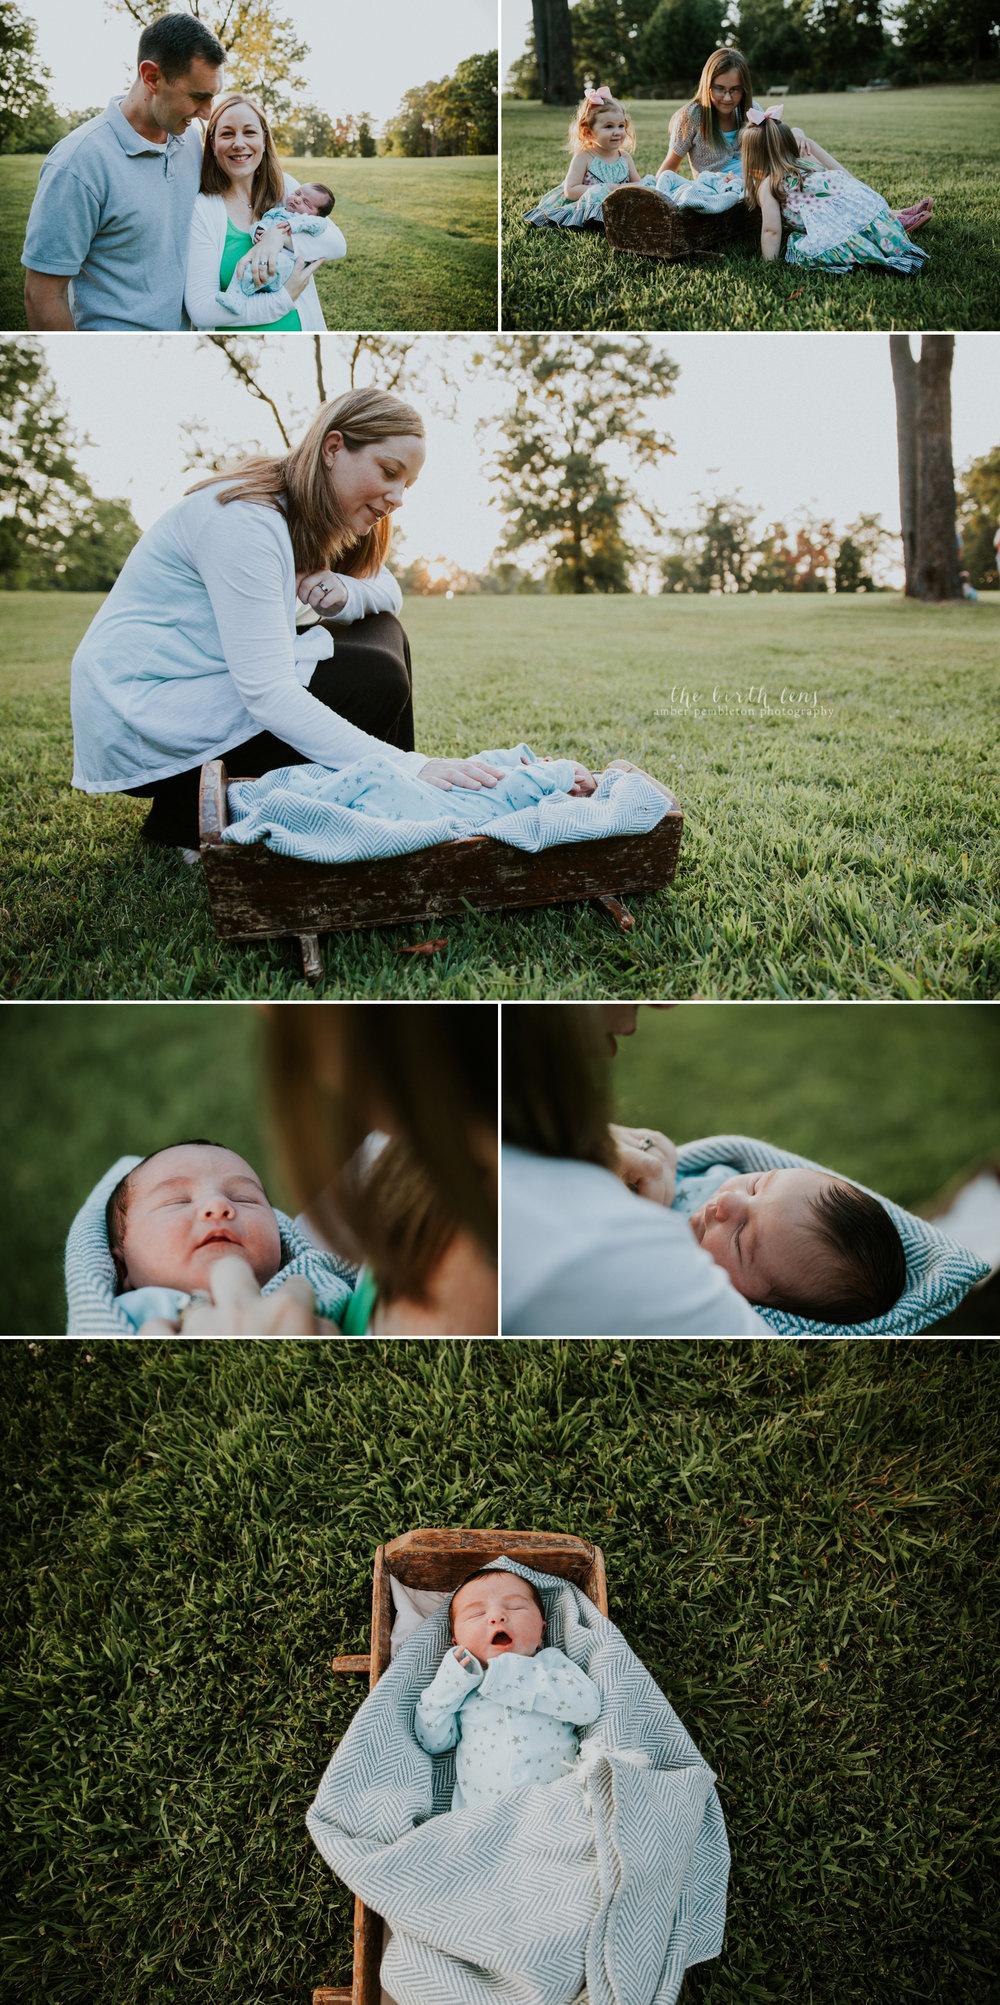 newborn-lifestlye-session-outdoors-tahoe.jpg